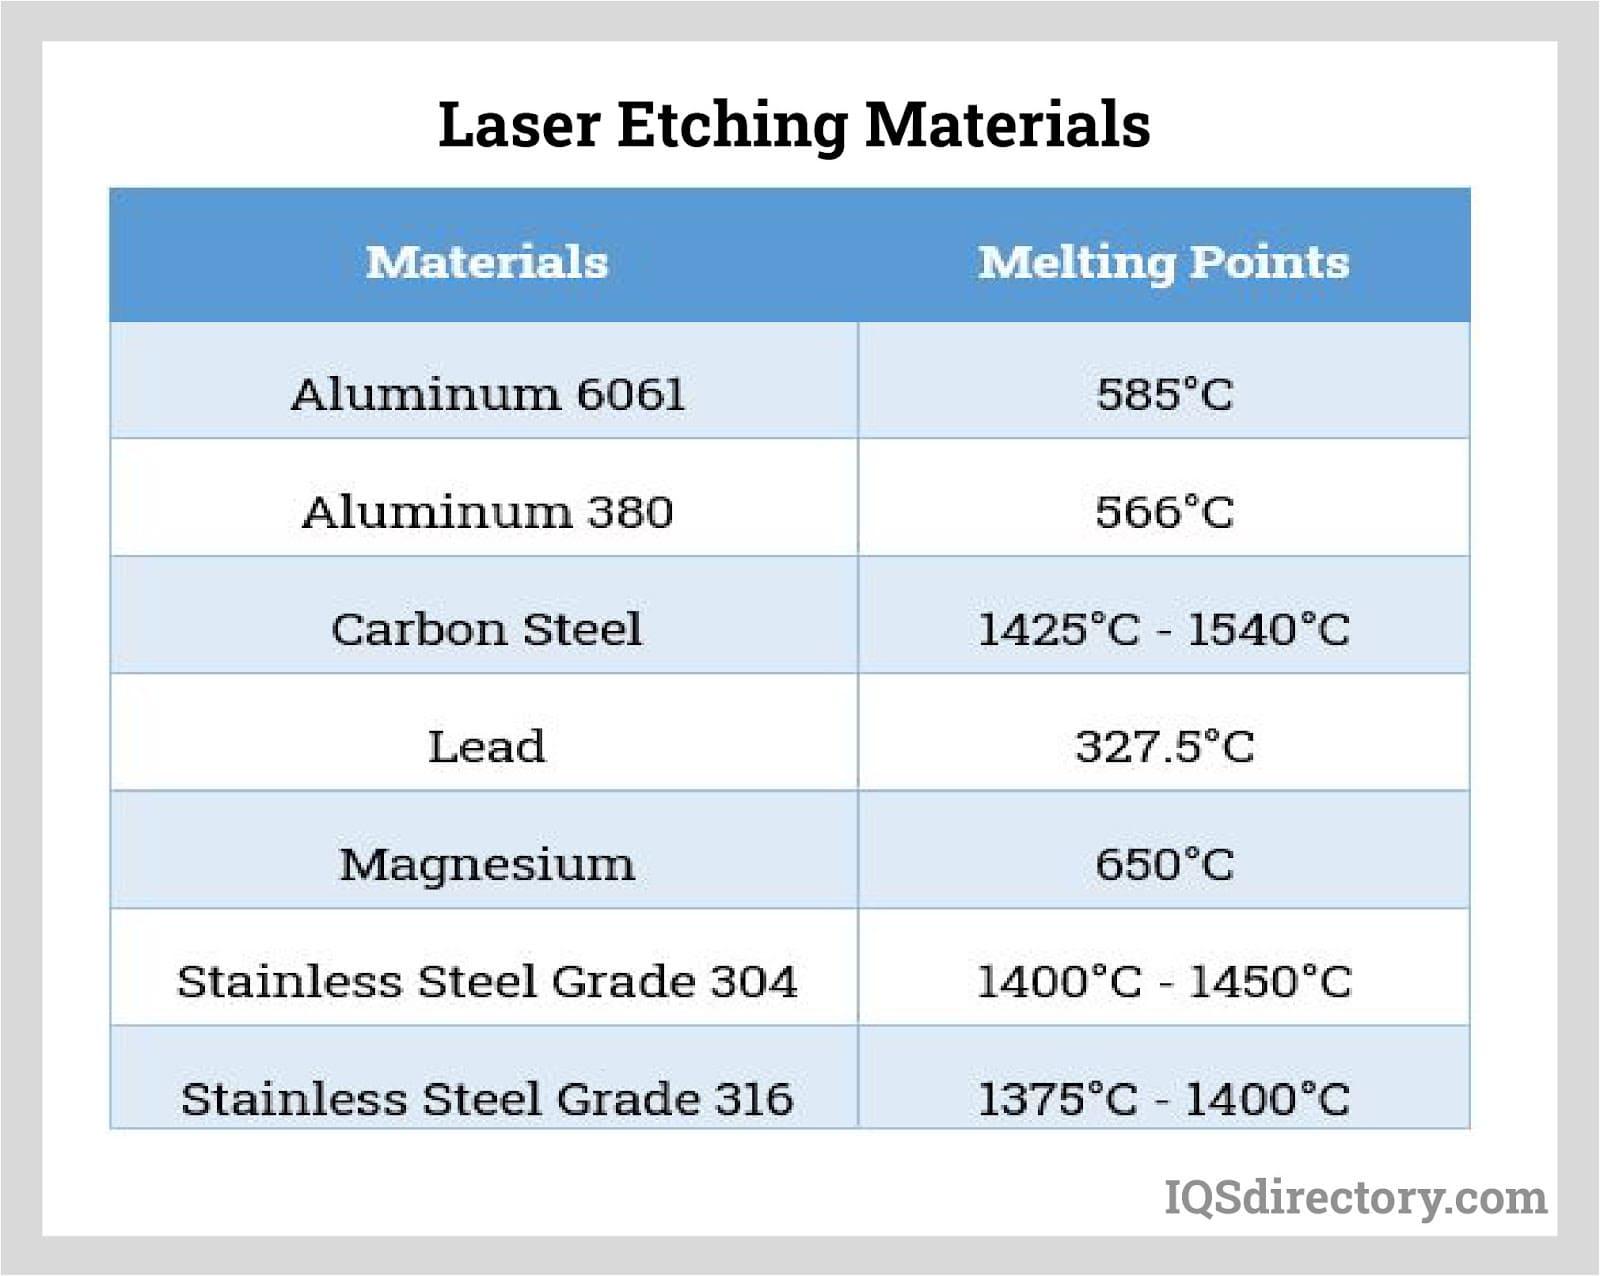 Laser Etching Materials